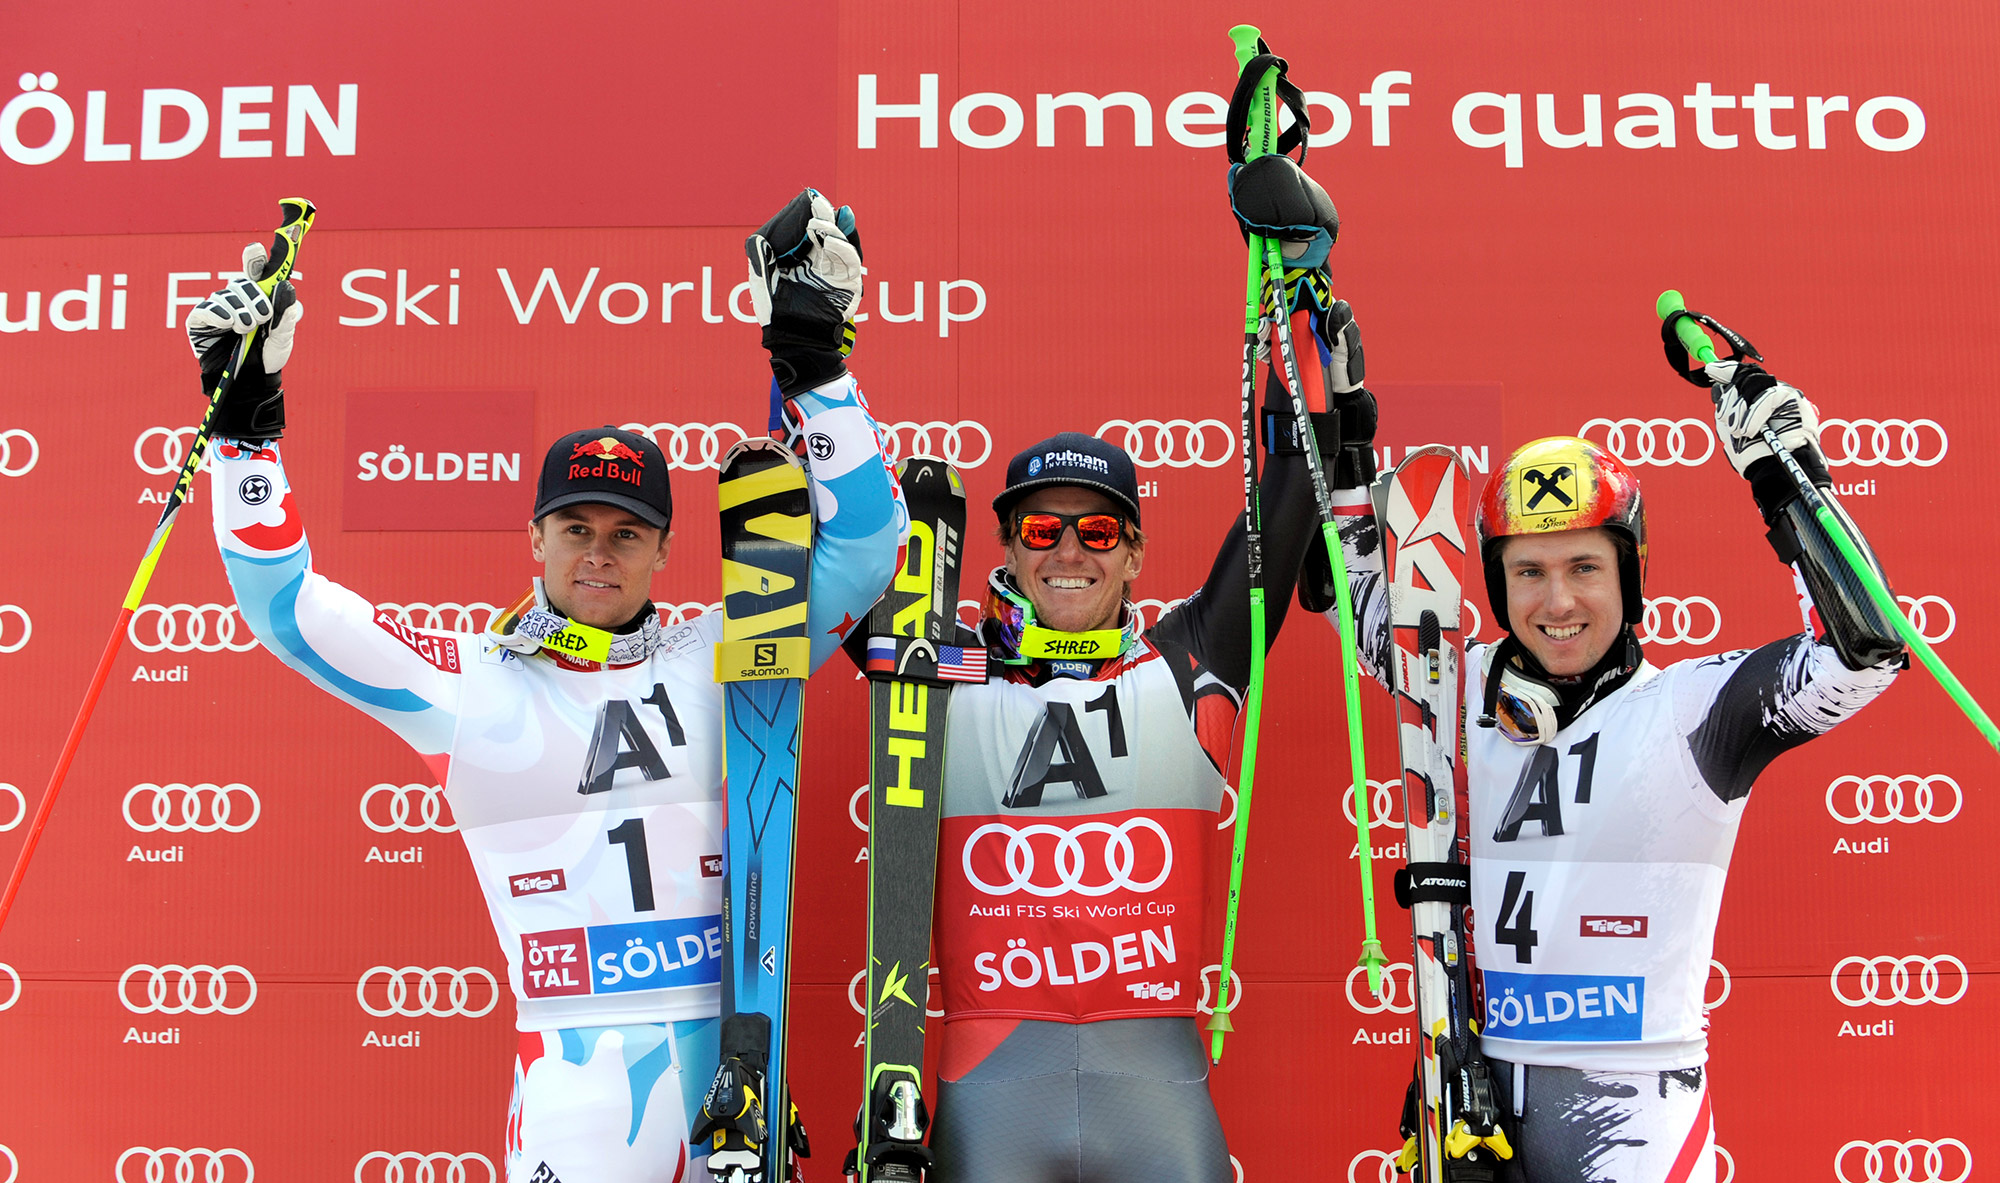 Last season's podium: Ligety, Alexis Pinturault and Marcel Hirscher.